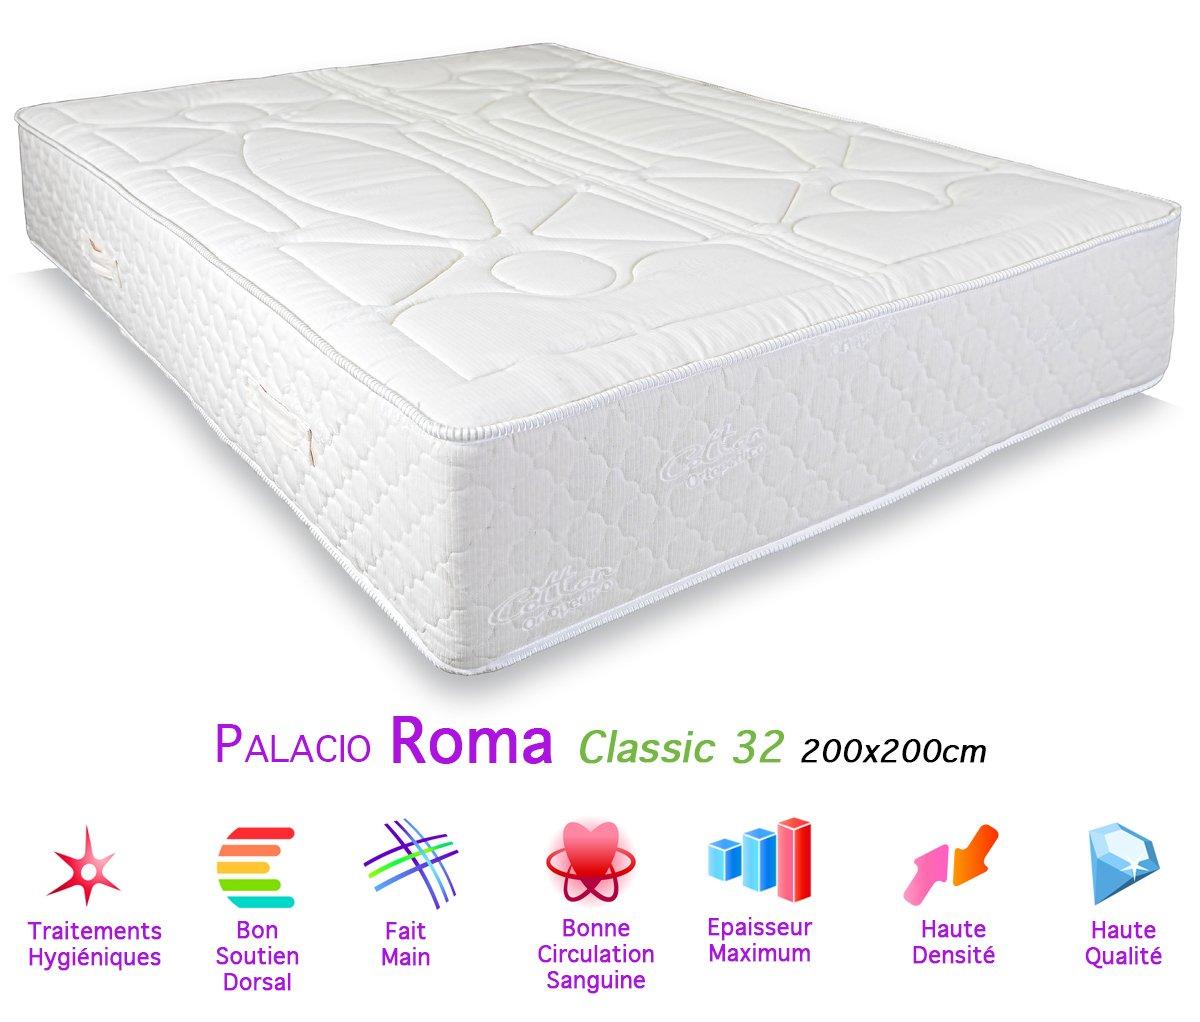 Palacio Roma Classic 32 Matratze, 200 x 200 cm günstig bestellen